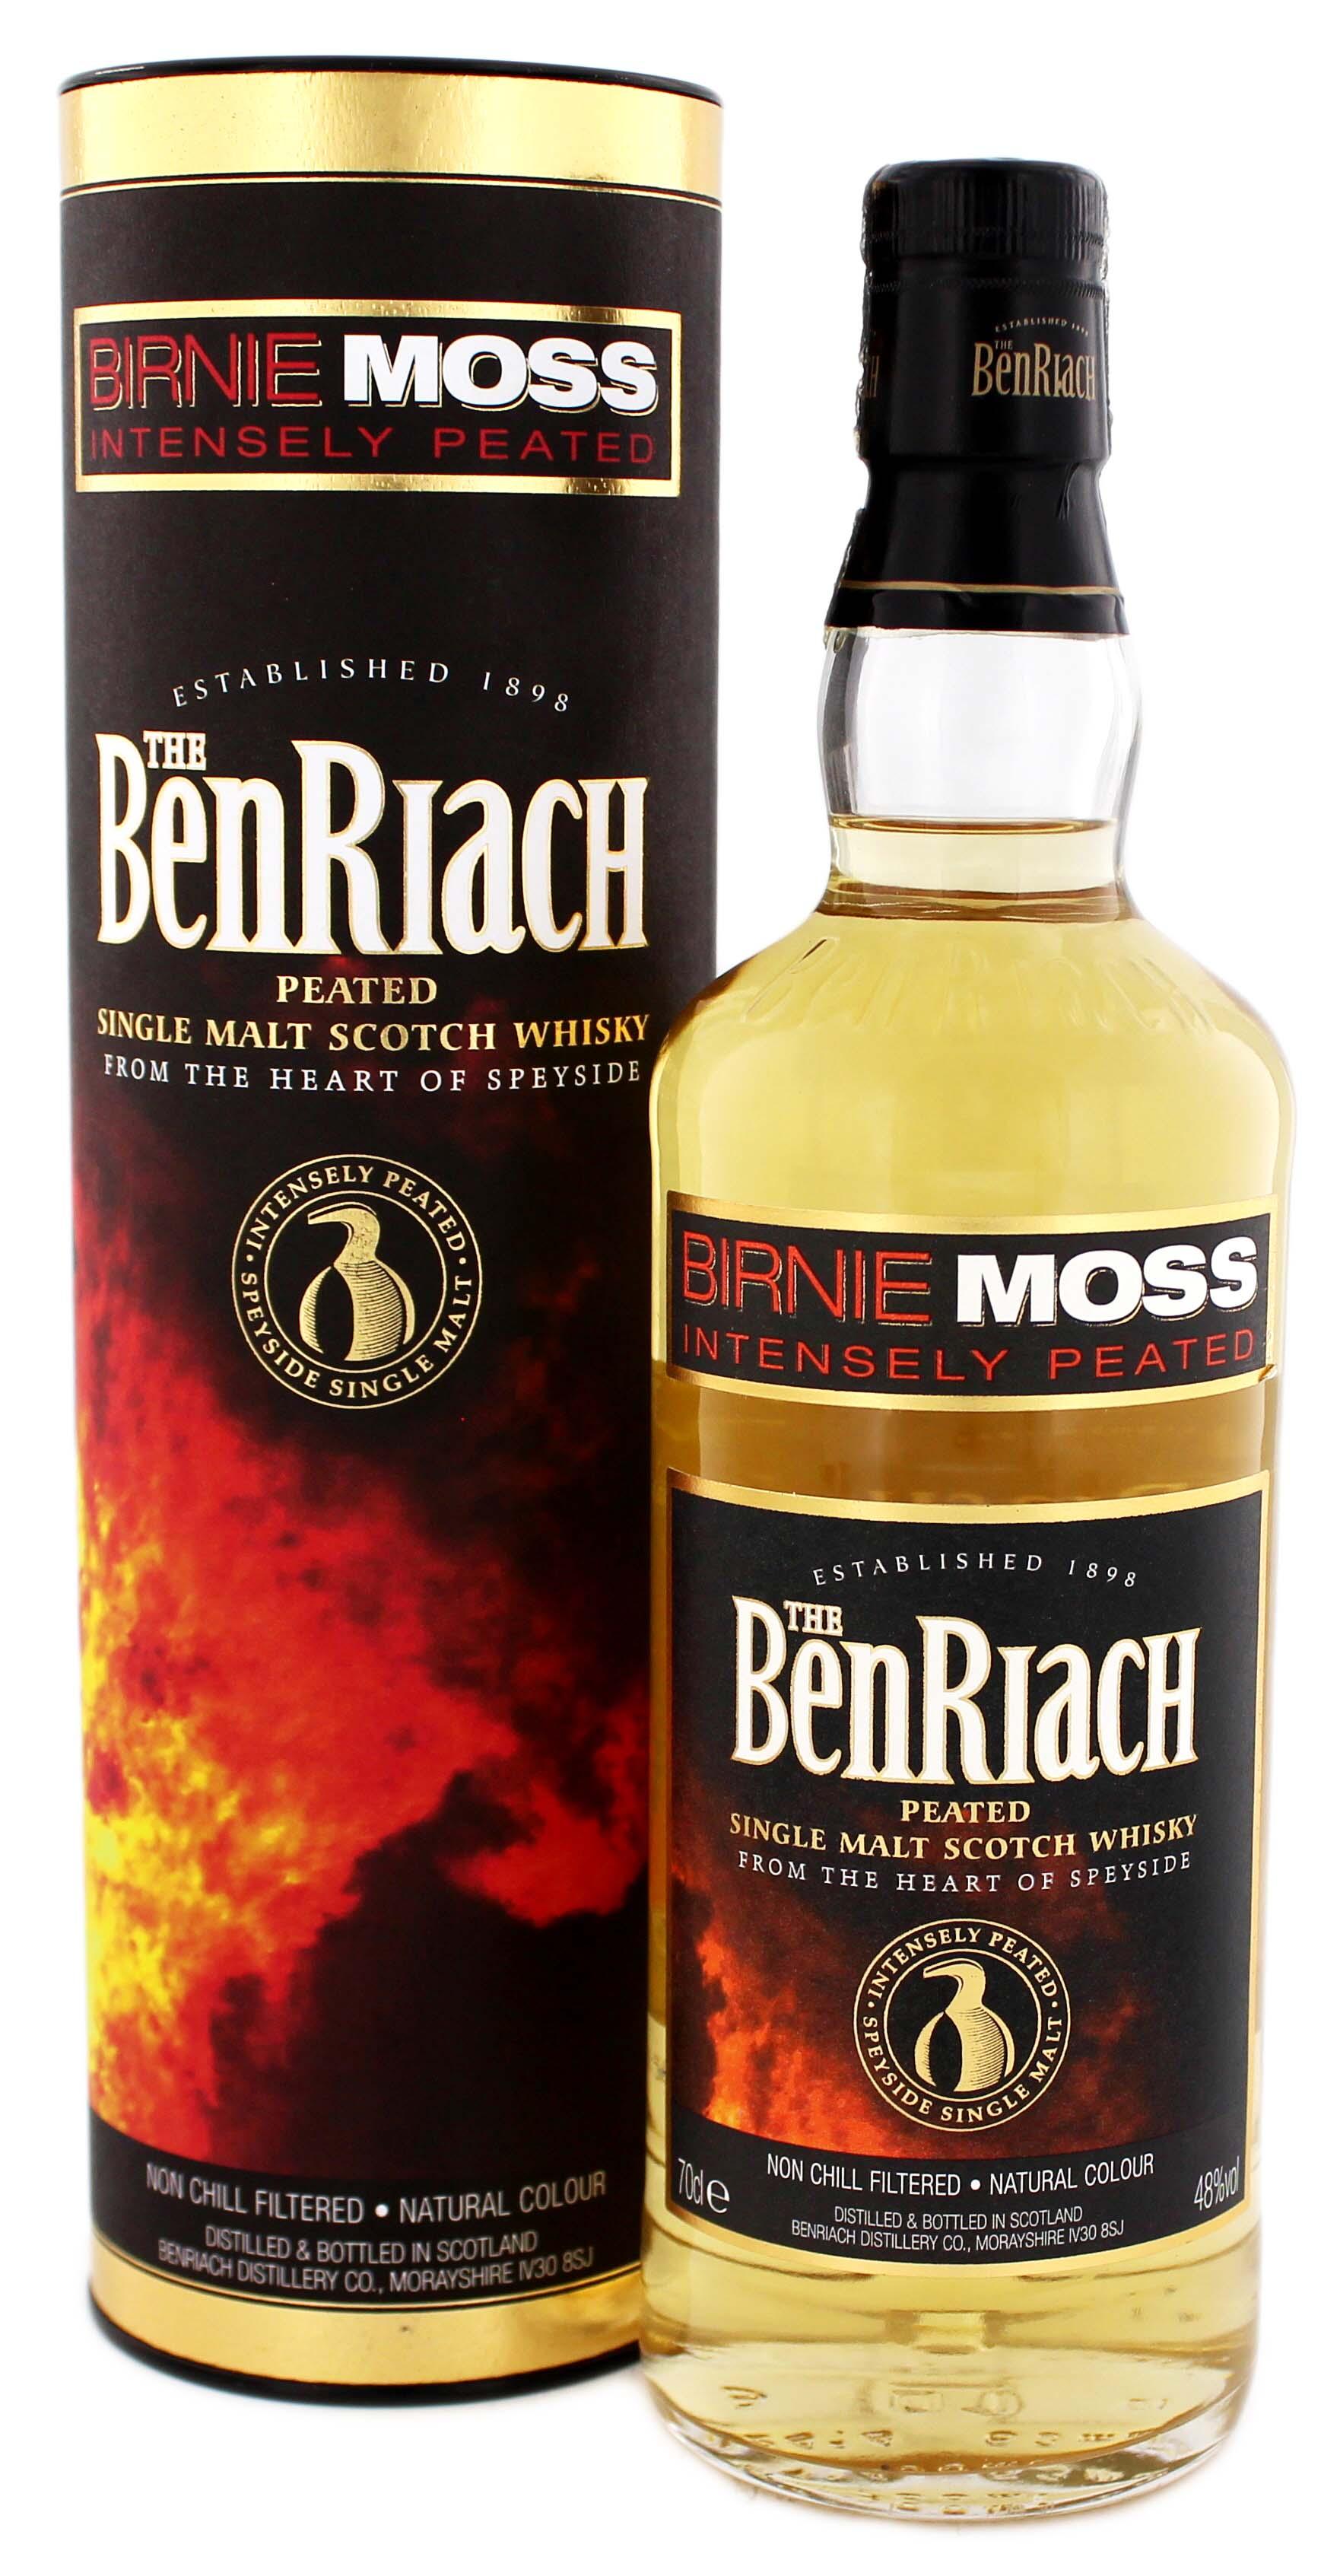 birnie moss benriach single malt whisky kaufen whisky online shop. Black Bedroom Furniture Sets. Home Design Ideas